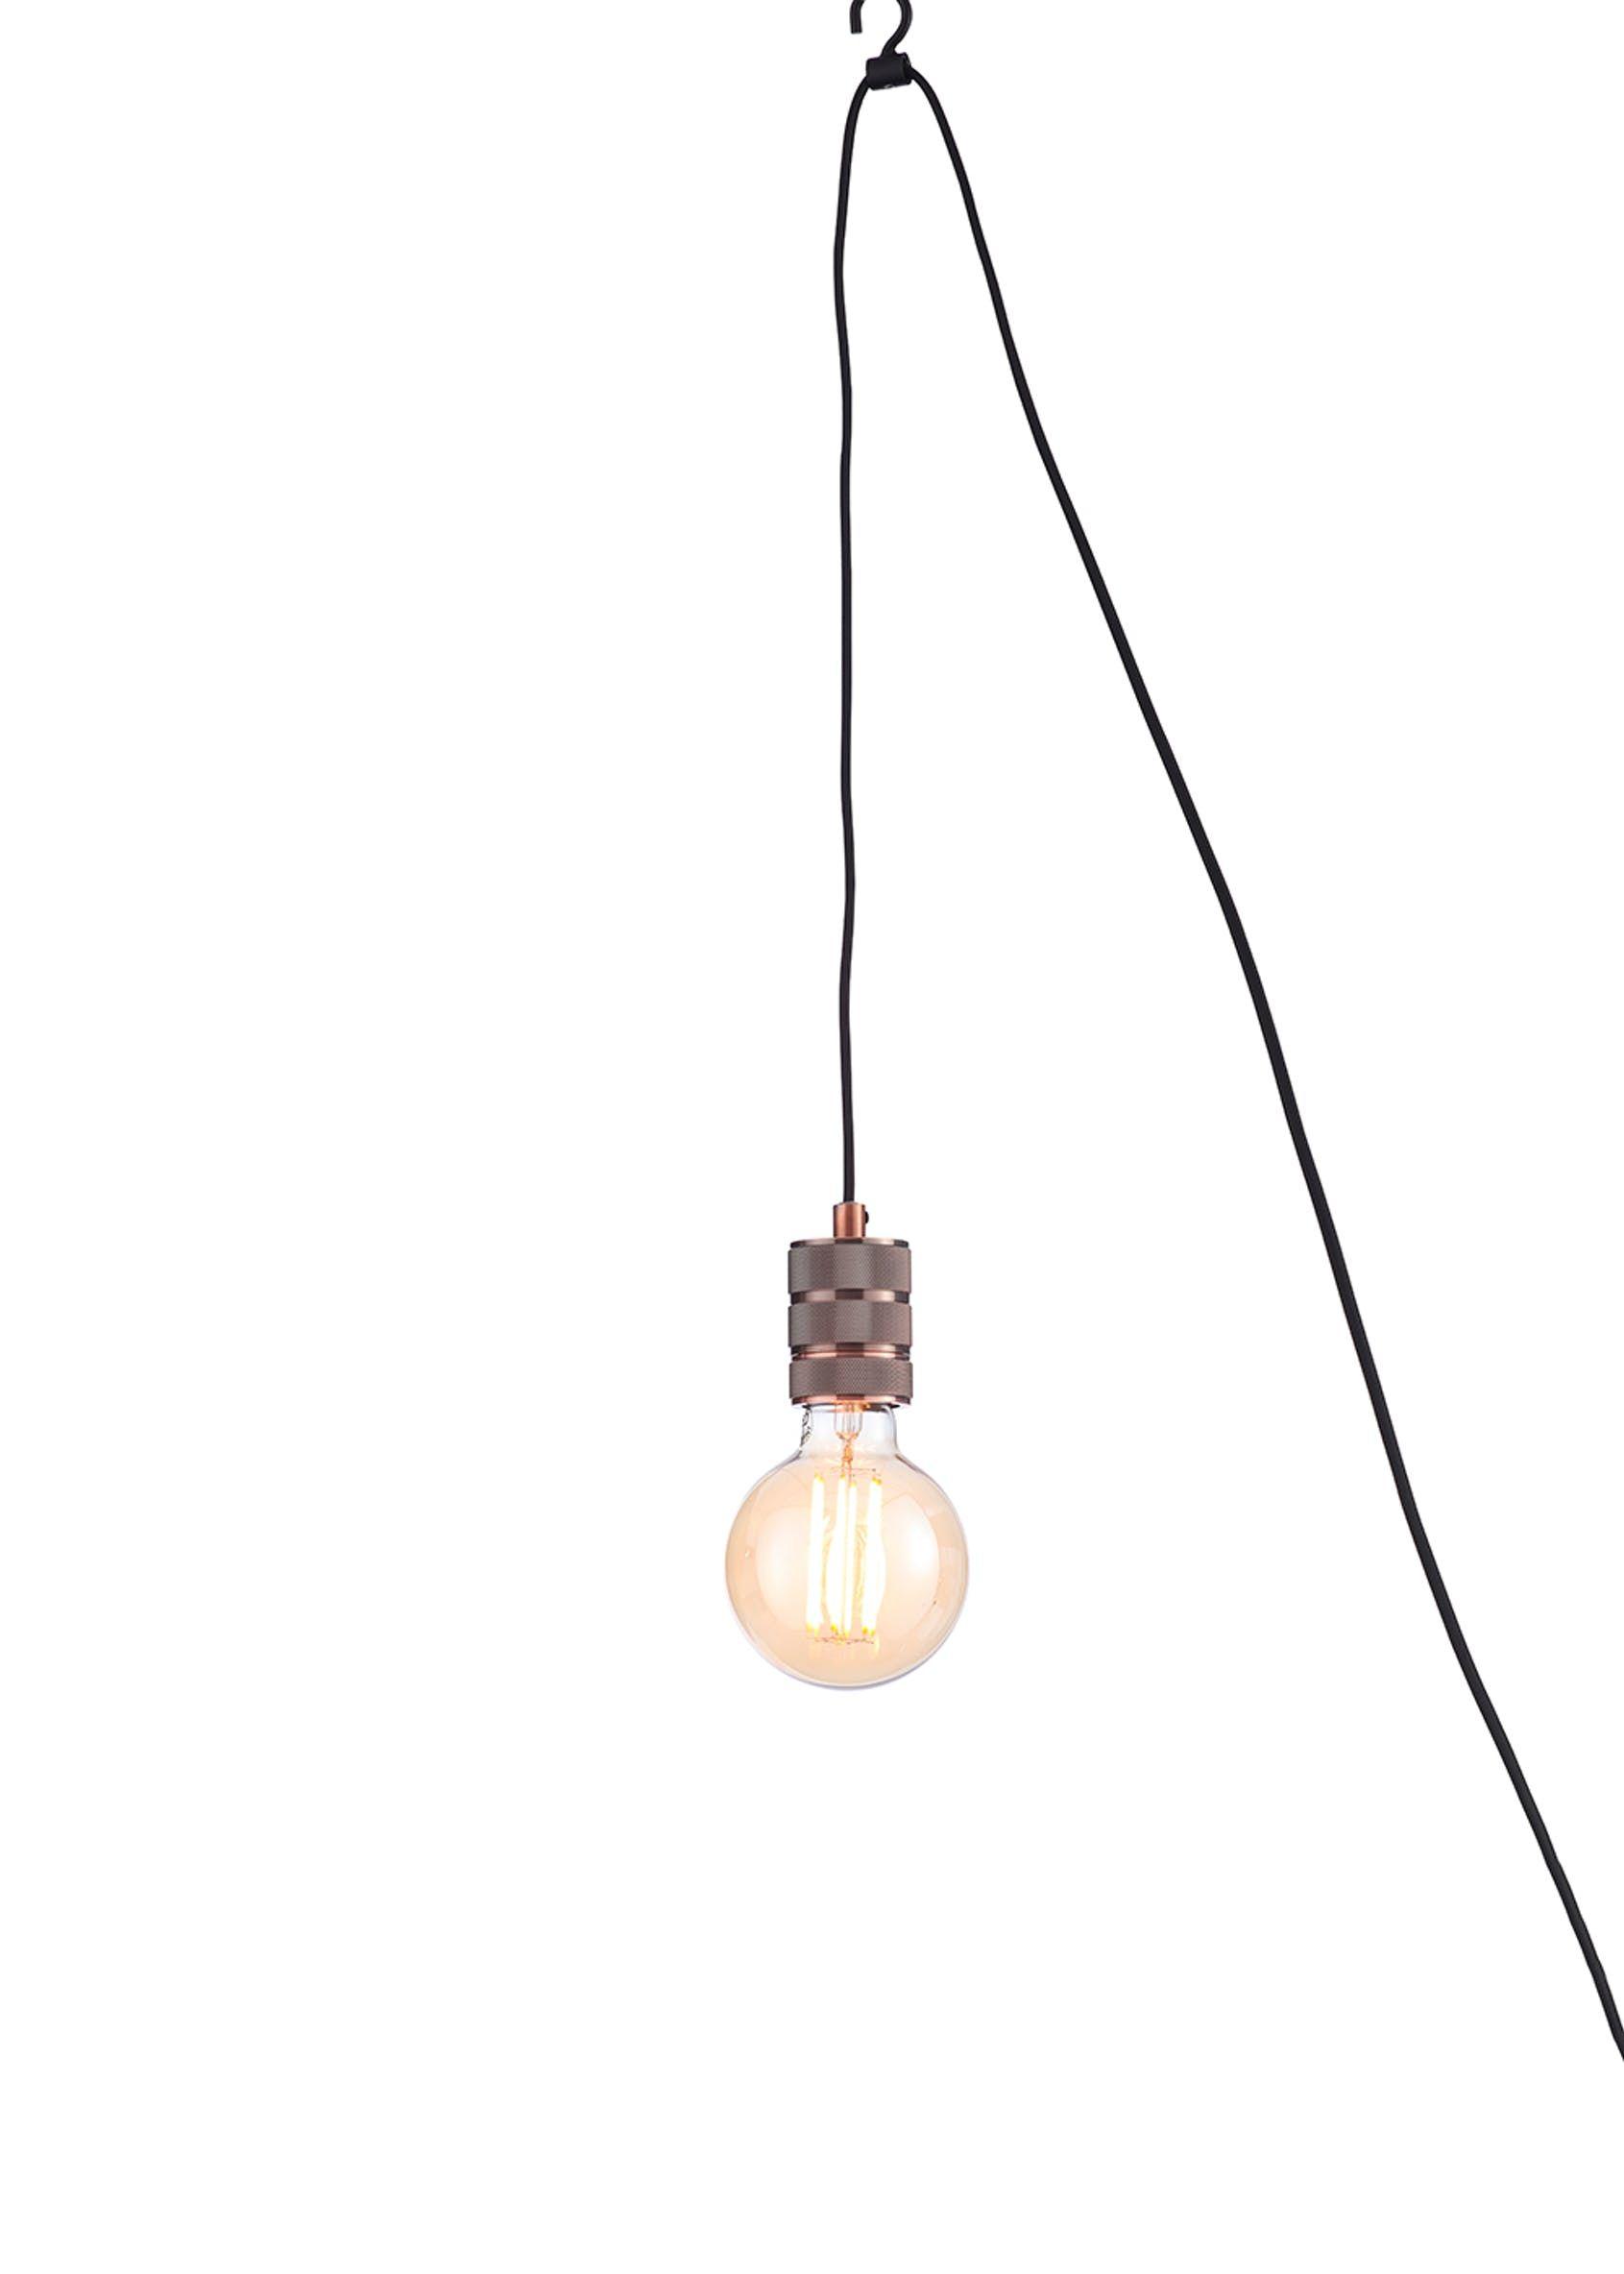 Hanging Pendant Lamp Holder H48 100cm X W6cm Metallic In 2020 Hanging Pendants Pendant Lamp Hanging Pendant Lamp